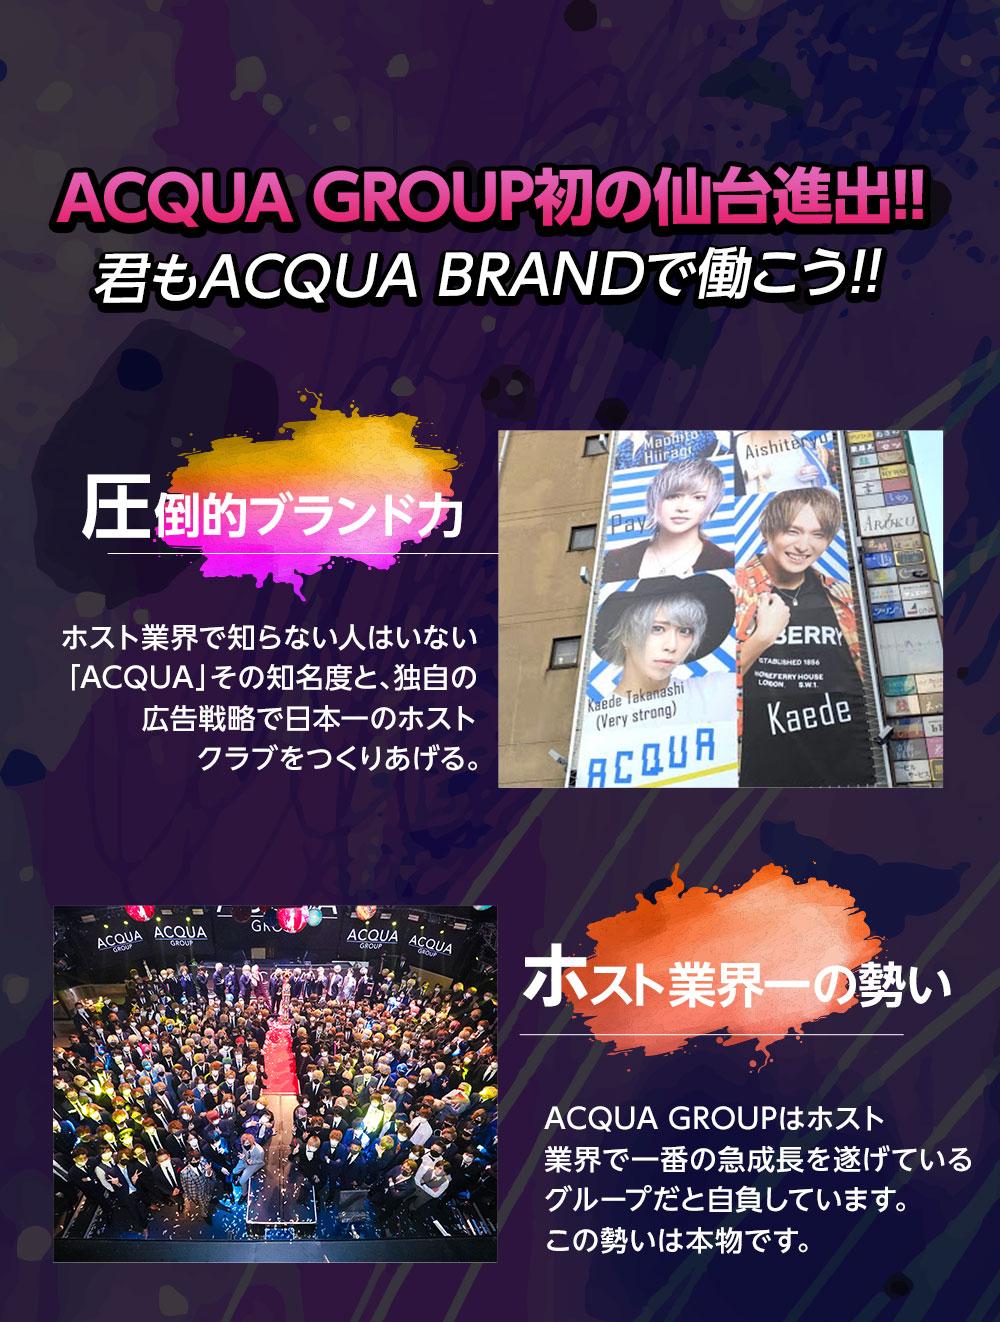 ACQUA GROUP初の仙台進出